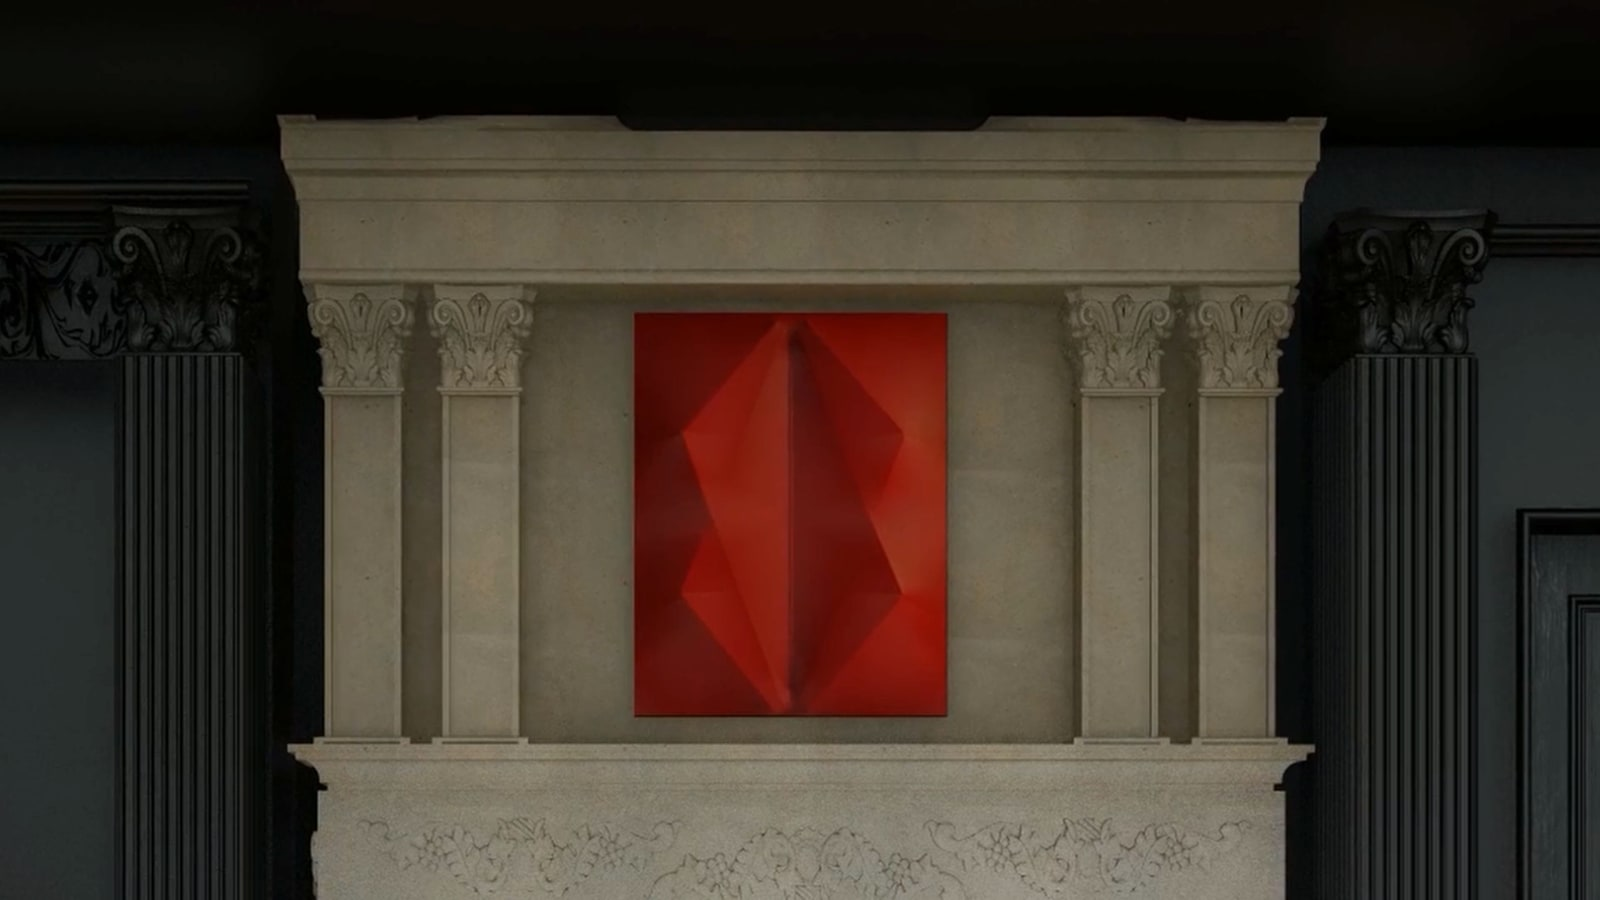 AGOSTINO BONALUMI Rosso, 2012 90 x 70 cm